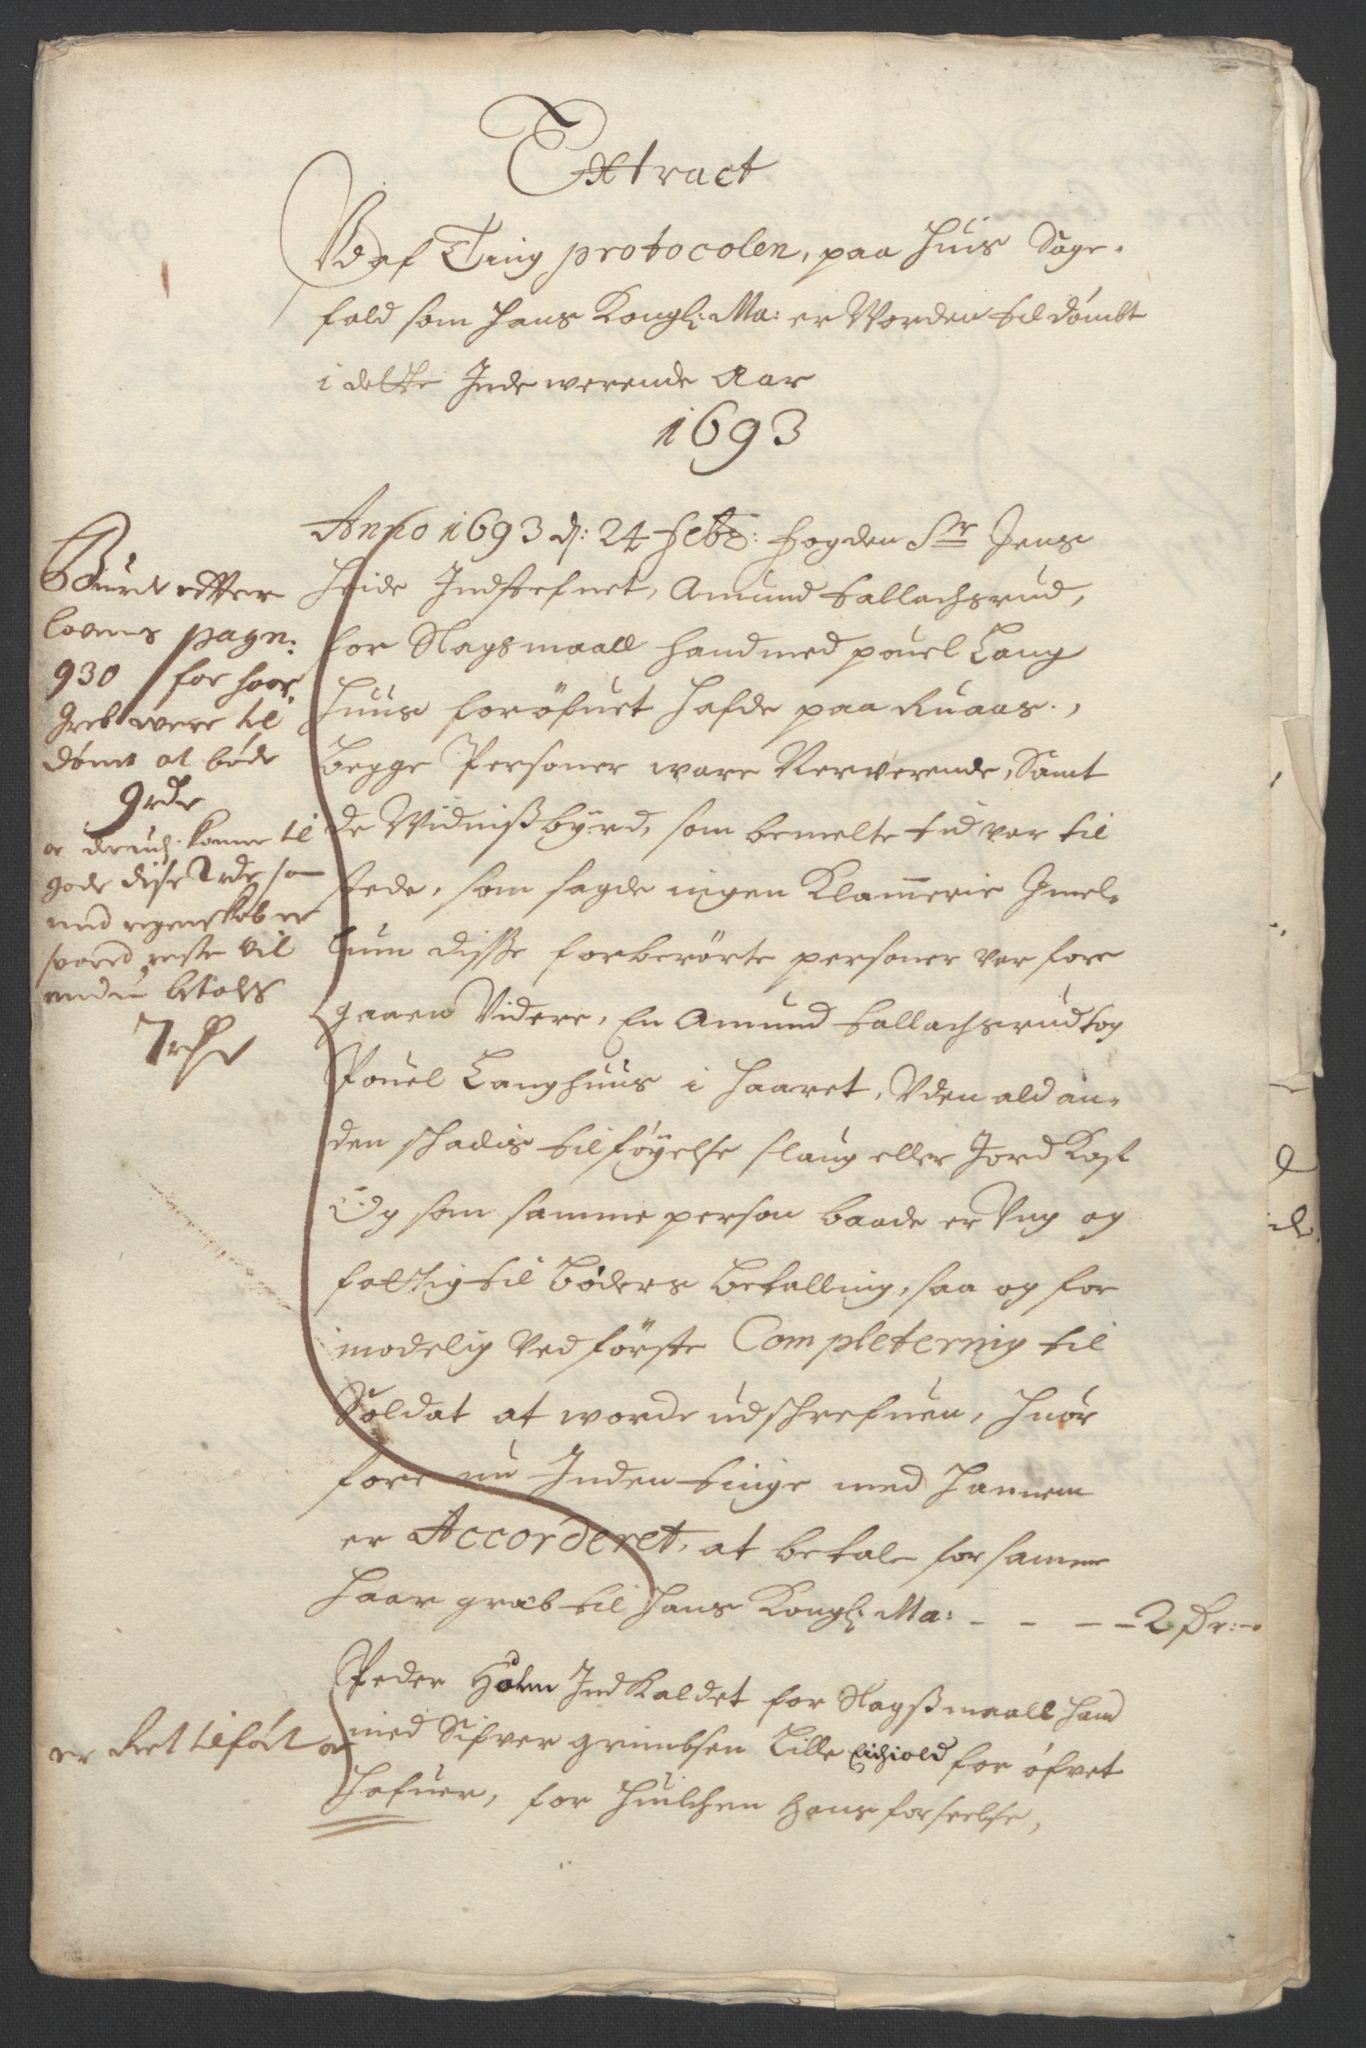 RA, Rentekammeret inntil 1814, Reviderte regnskaper, Fogderegnskap, R09/L0437: Fogderegnskap Follo, 1692-1693, s. 253